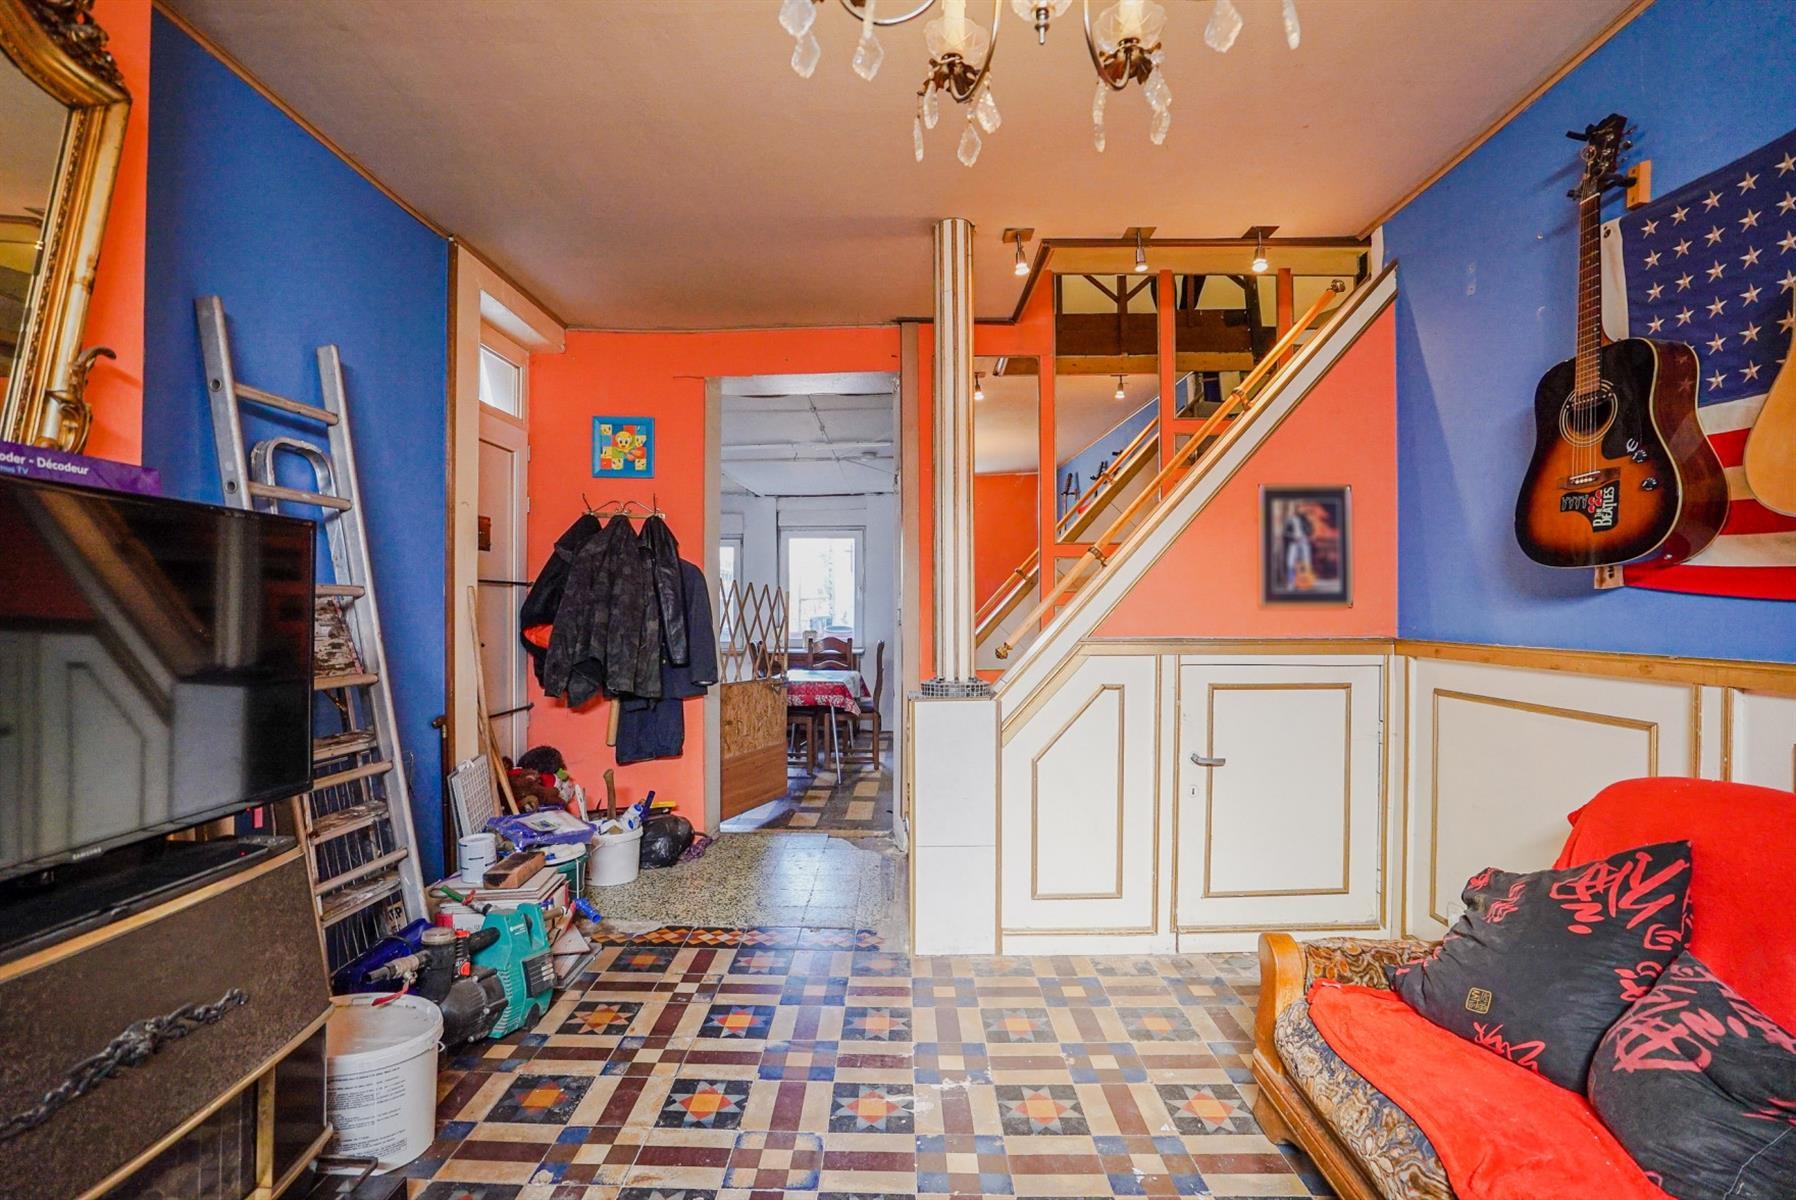 Maison - Oupeye Hermallesous-Argenteau - #4324098-2